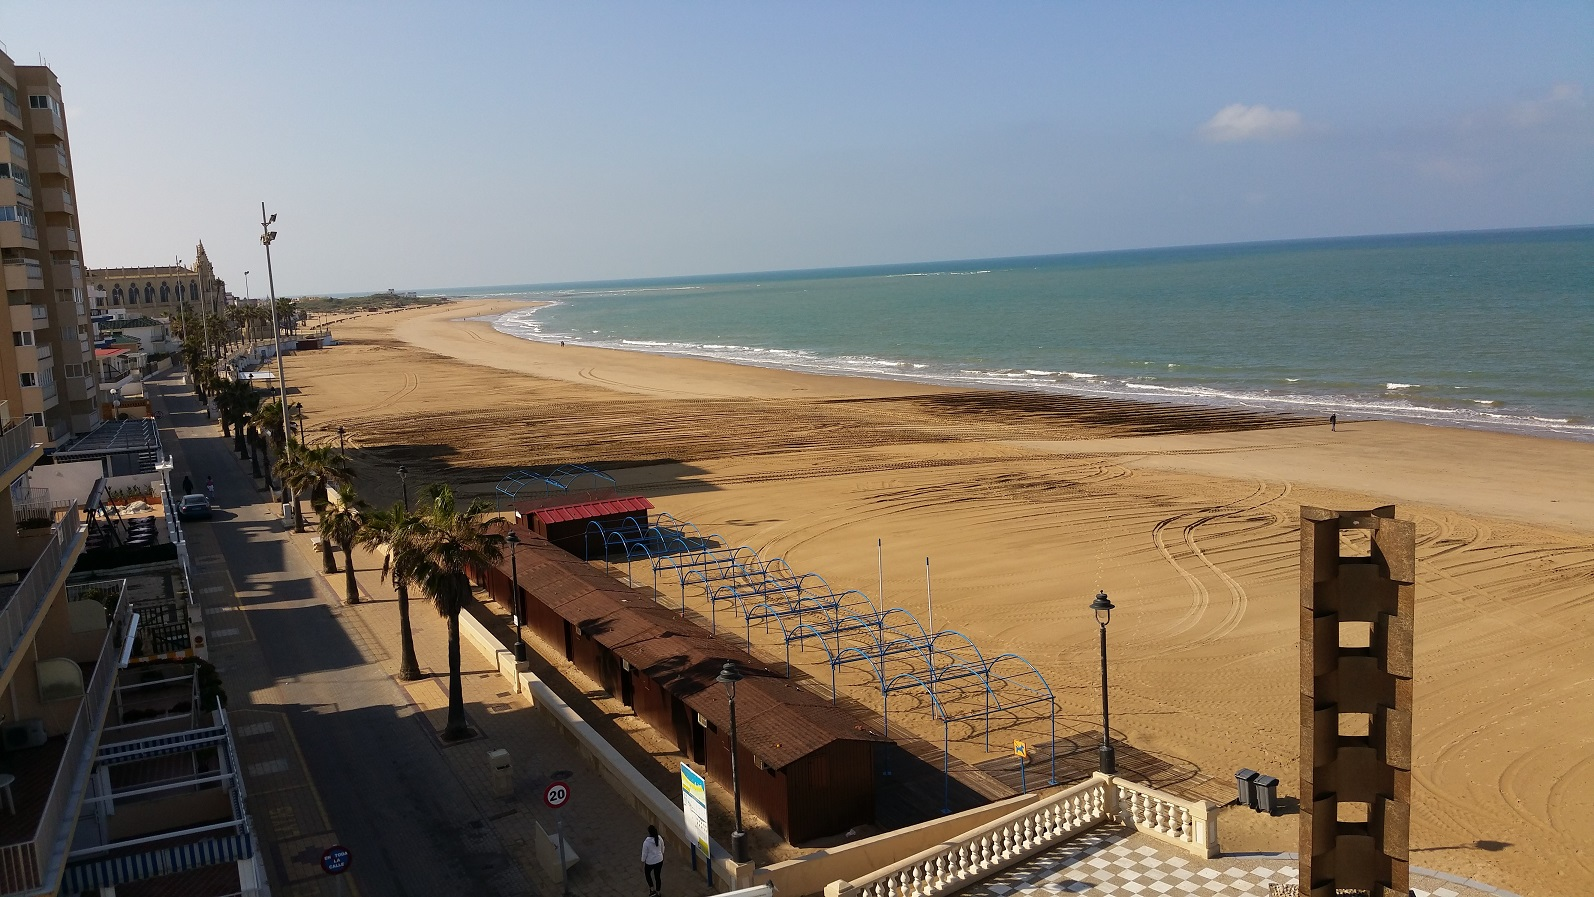 playa de regla aerea 3